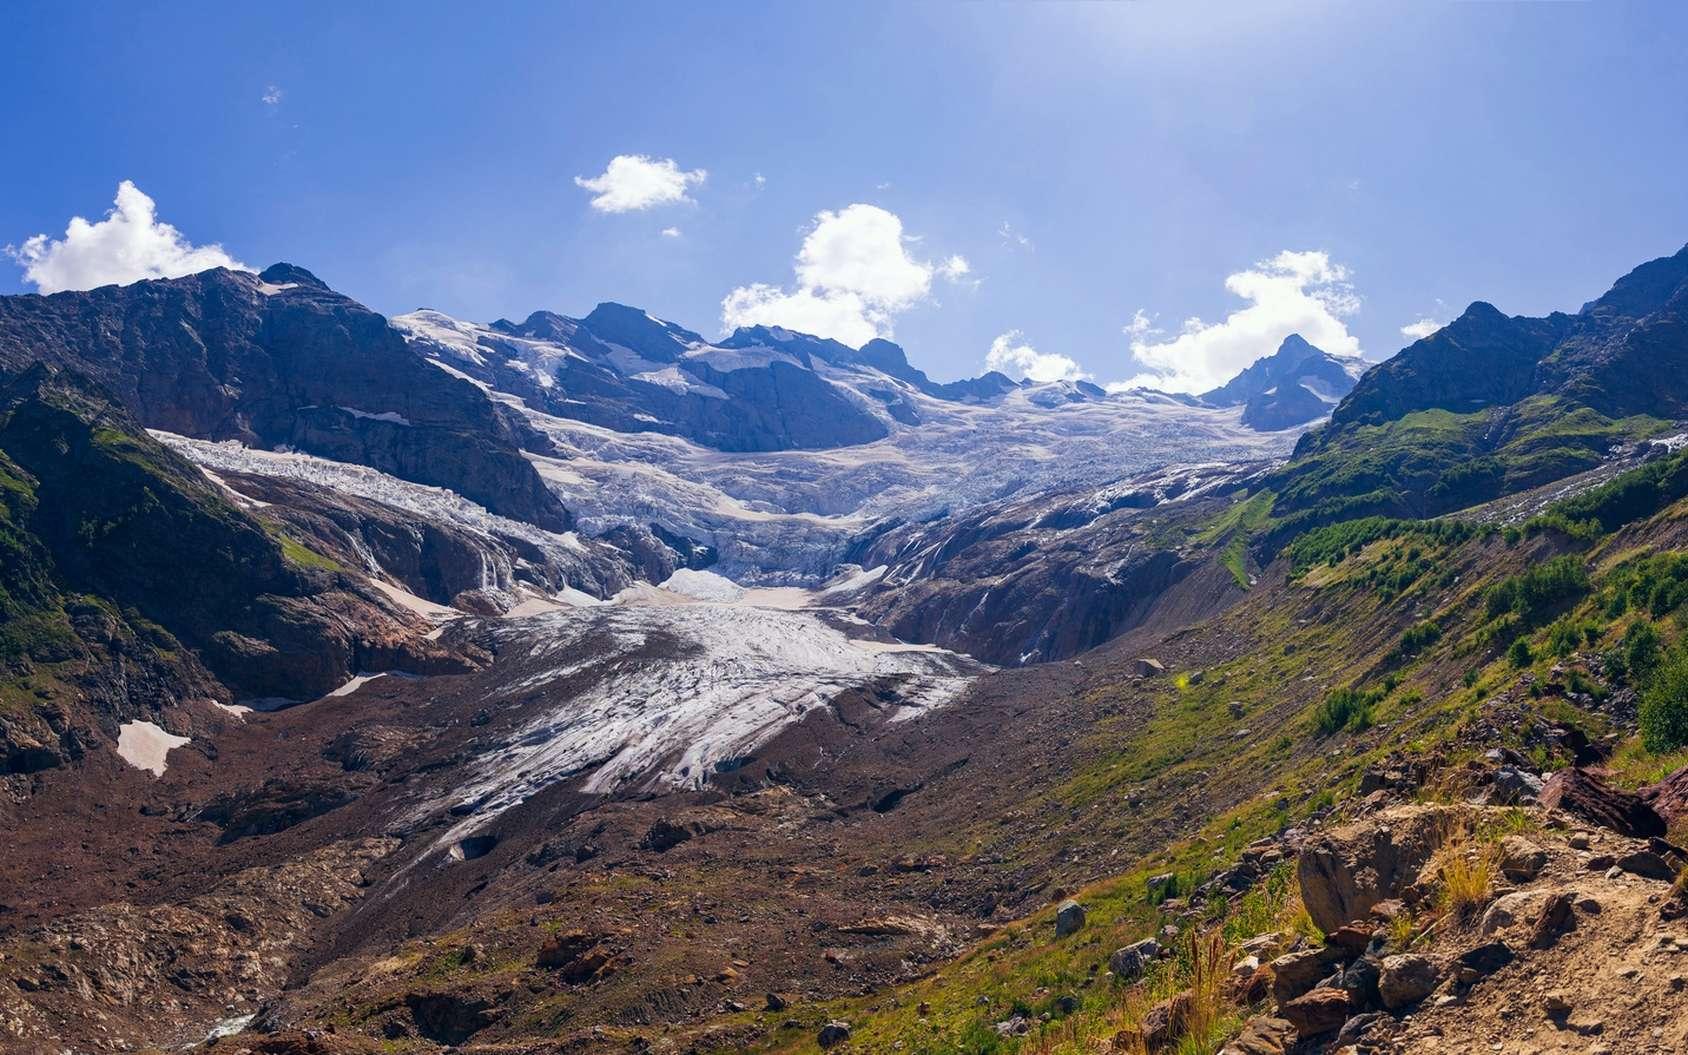 Glacier dans le Caucase. © dmitriydanilov62, fotolia